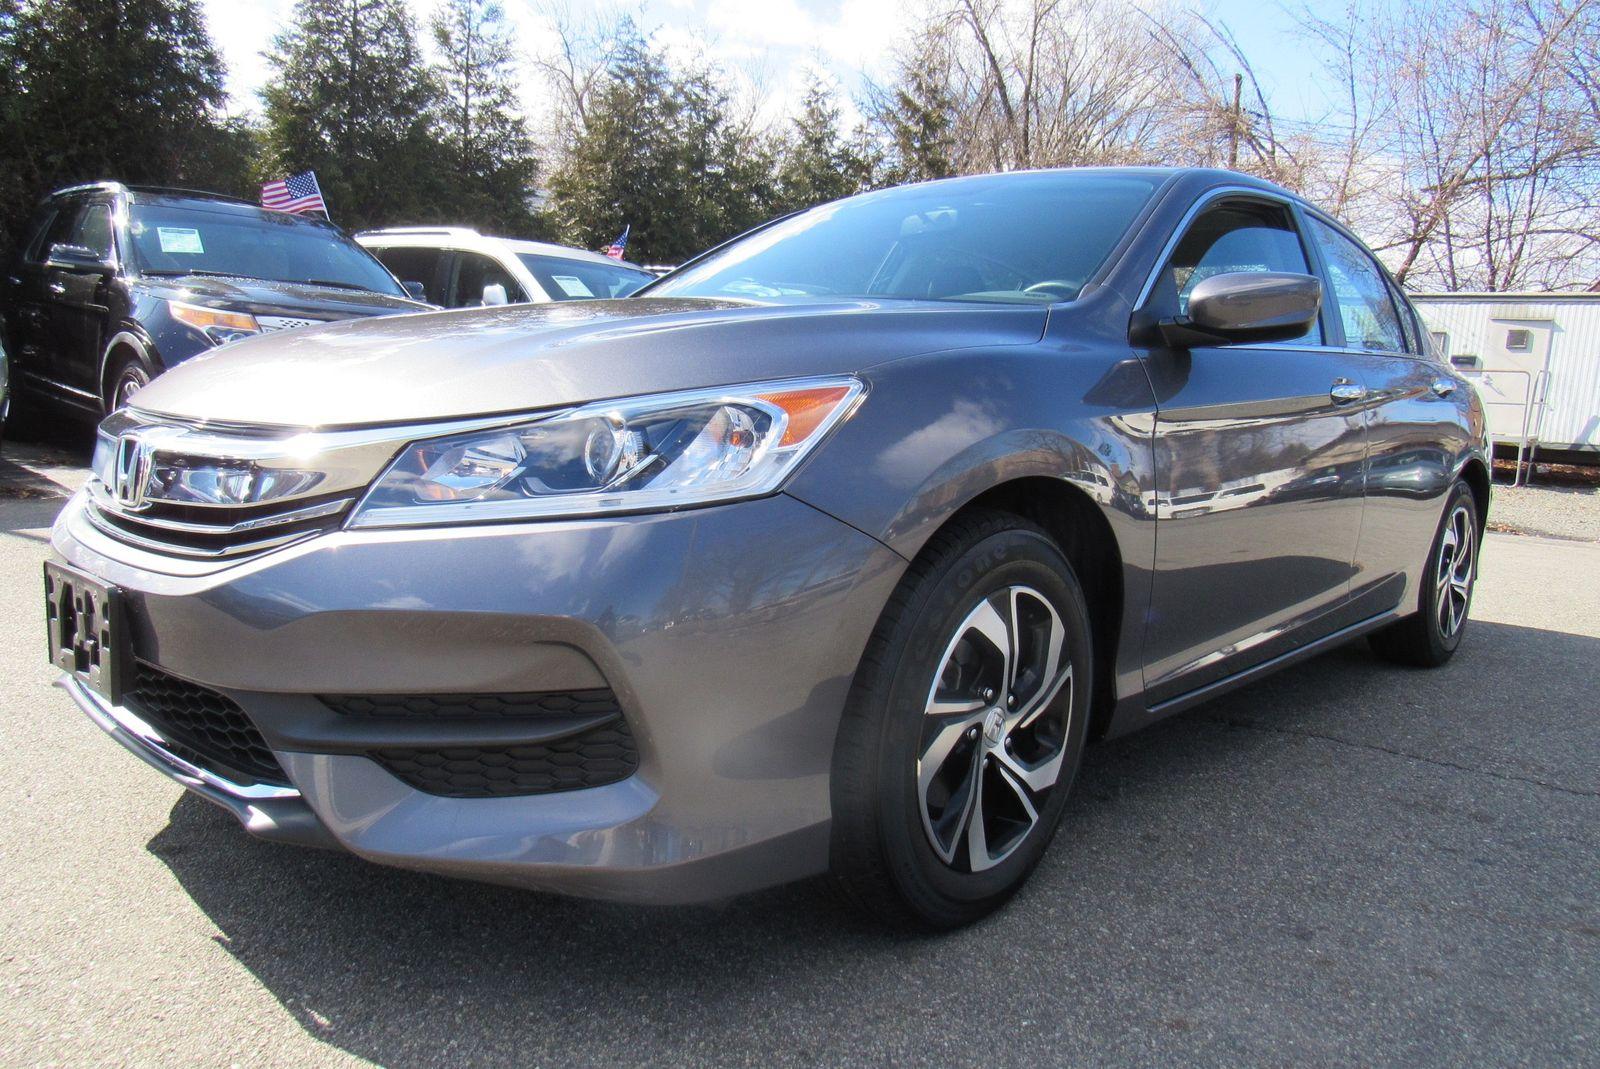 2017 Honda Accord sedan . Lot 999186417438 Vin 1HGCR2F33HA157156